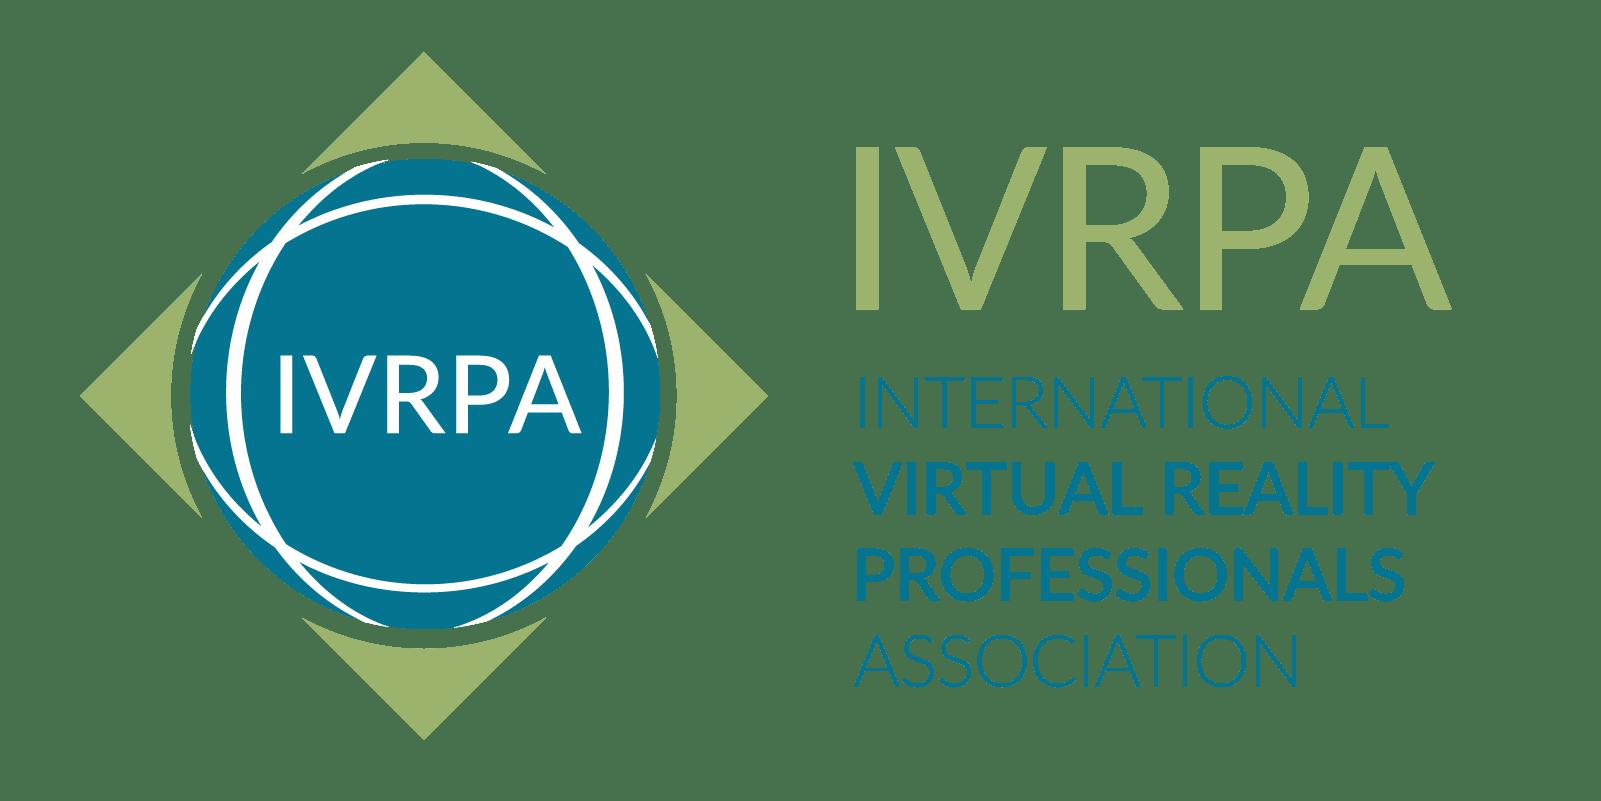 IVRPA-Professionals-logo